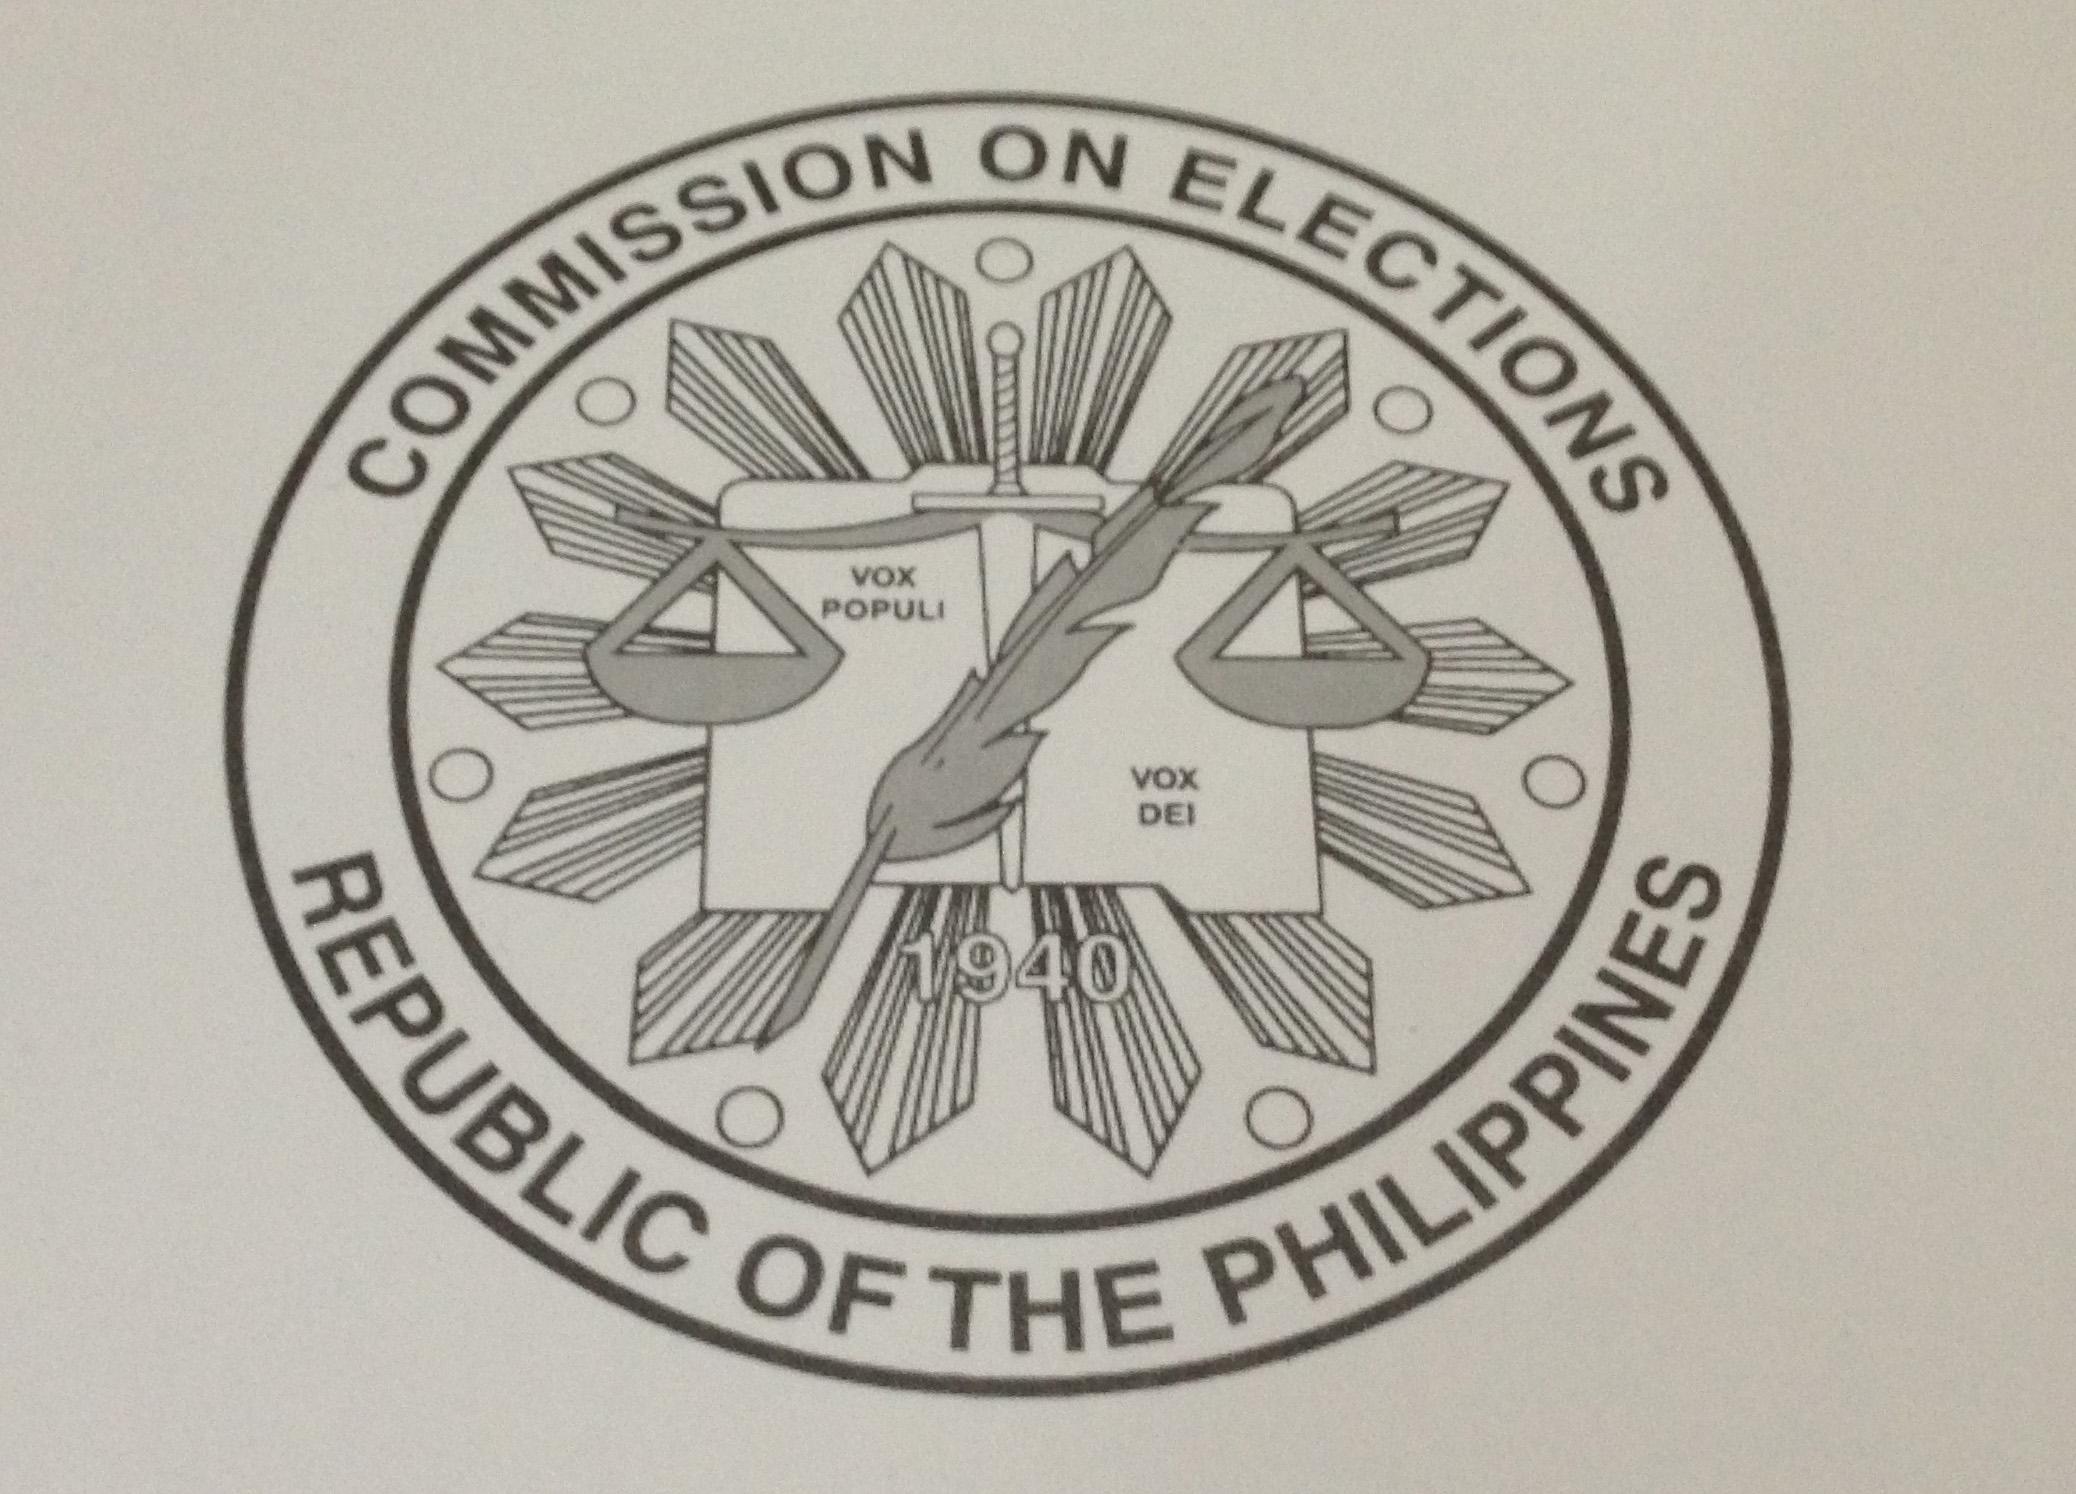 Official: Winning Barangay Captains & Councilors 2013 - Biliran